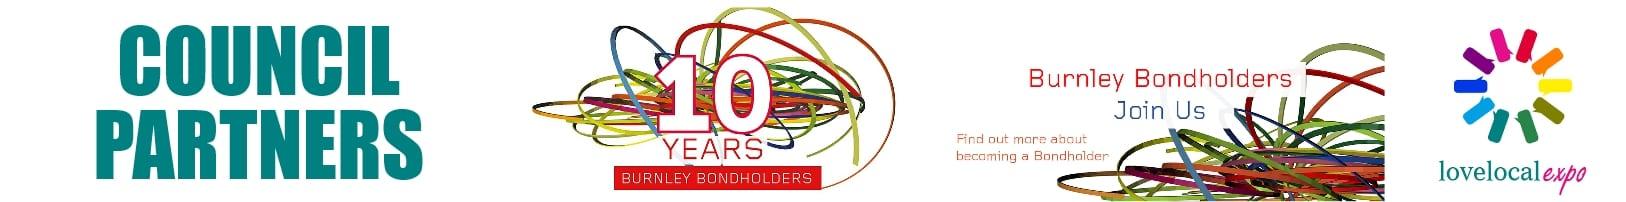 lle20 site scroll graphic council bondholders